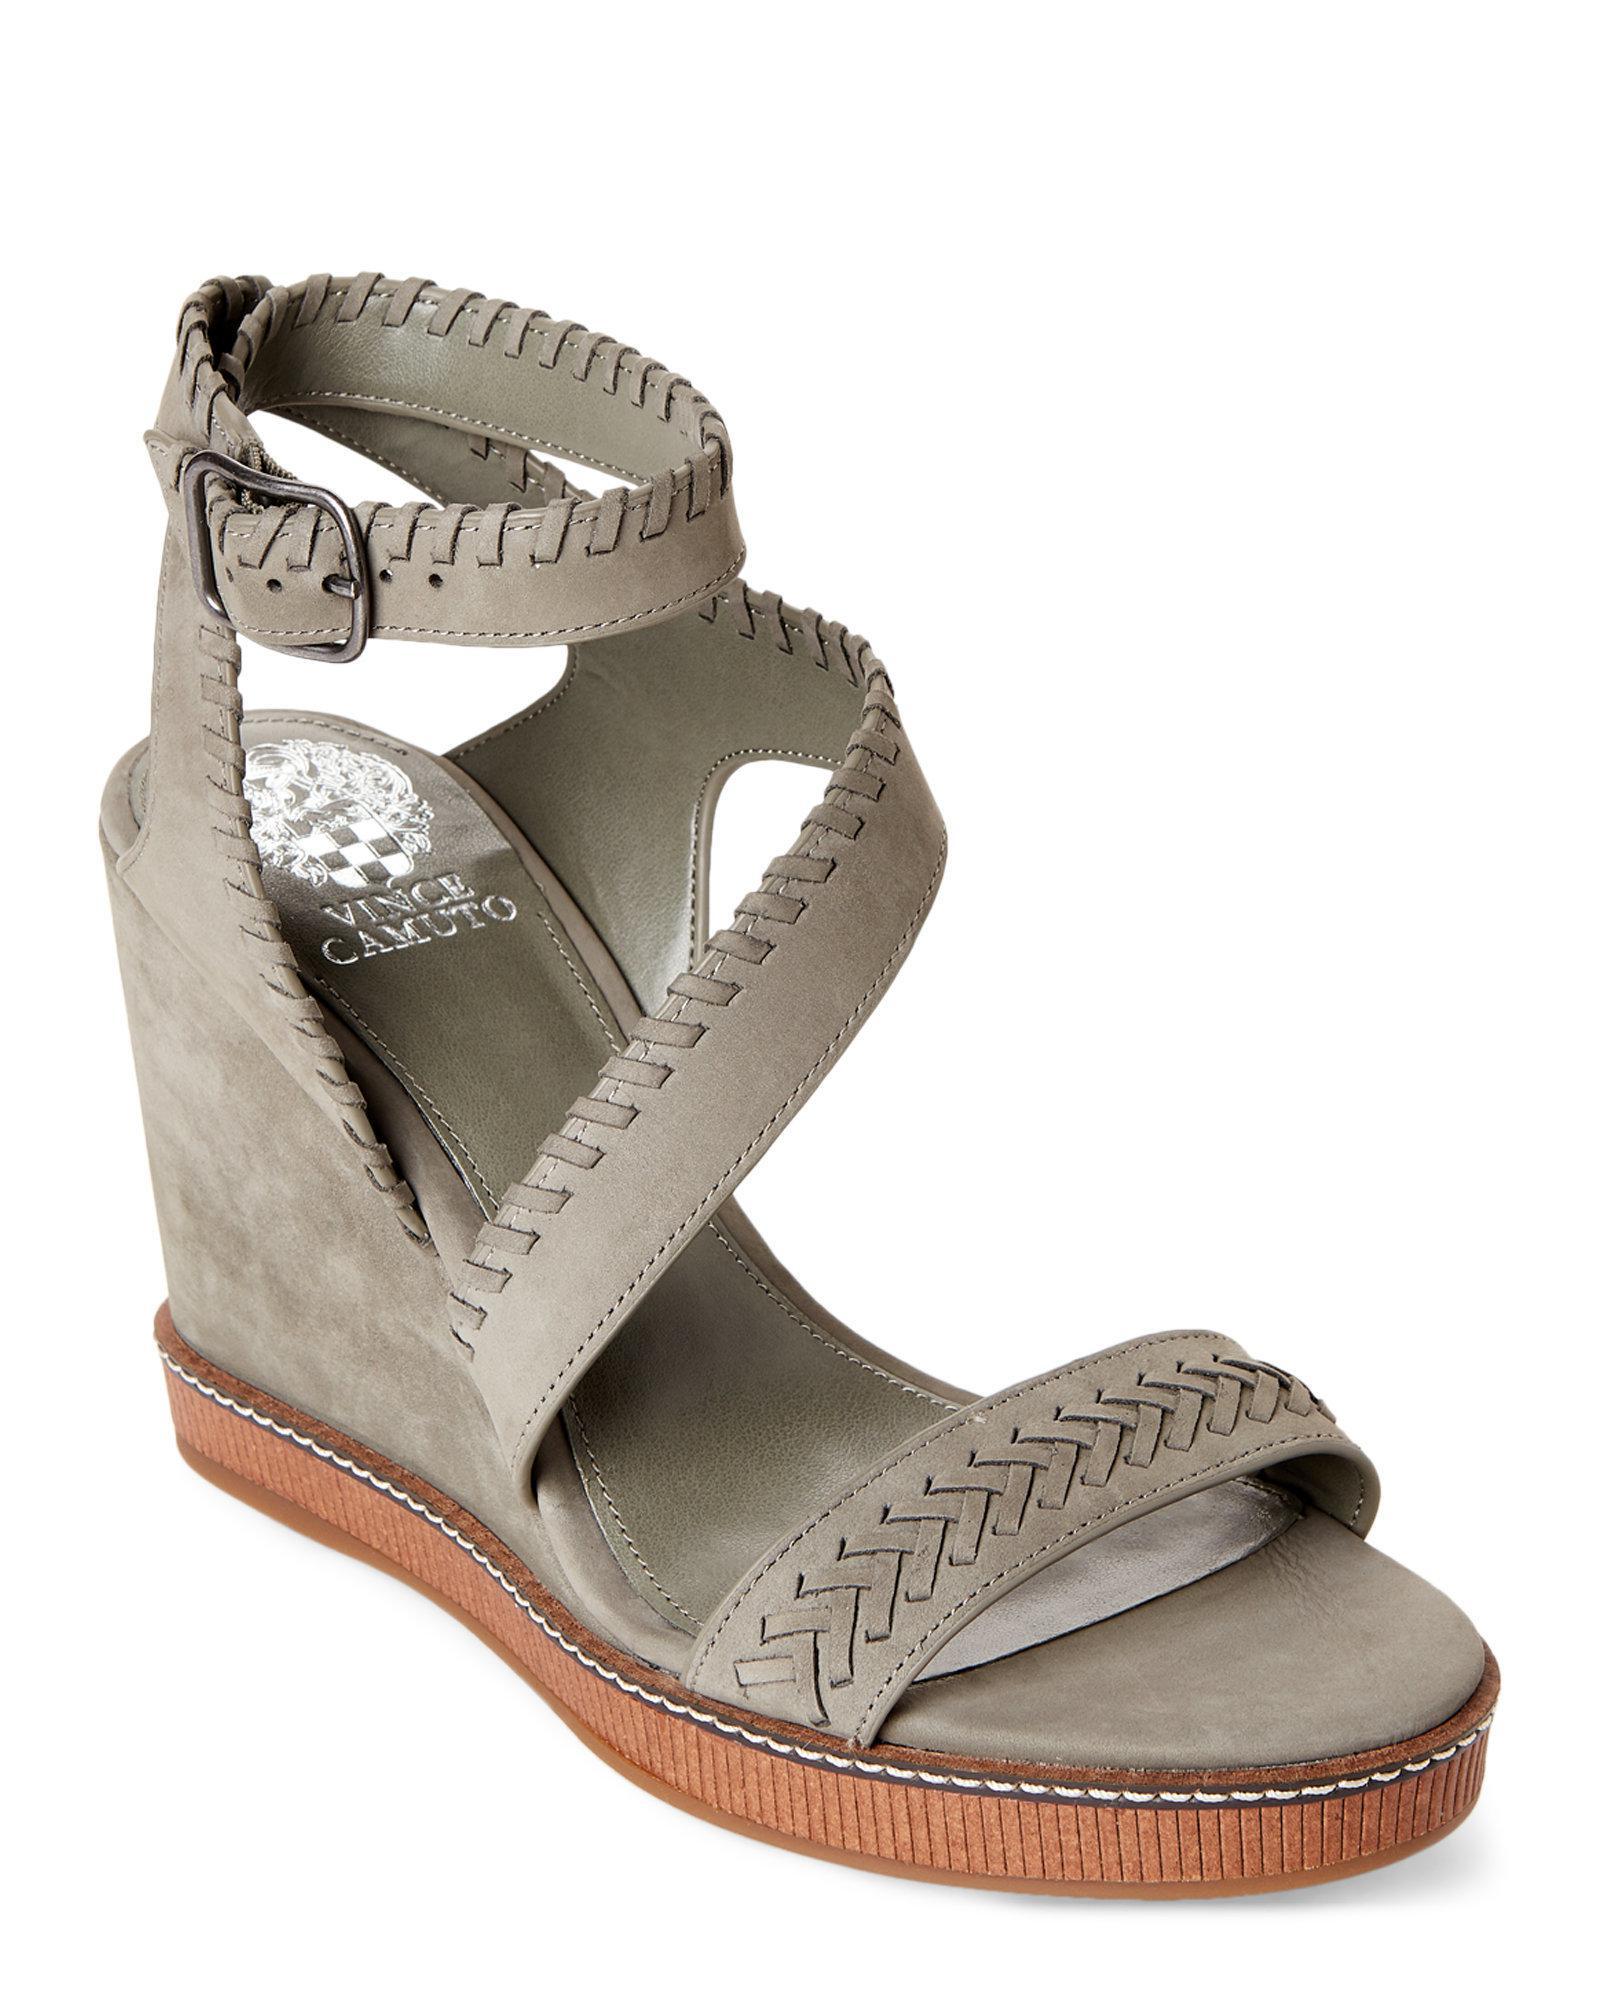 ee2c6ebab4bb Lyst - Vince Camuto Urban Jungle Ivanta Platform Wedge Sandals